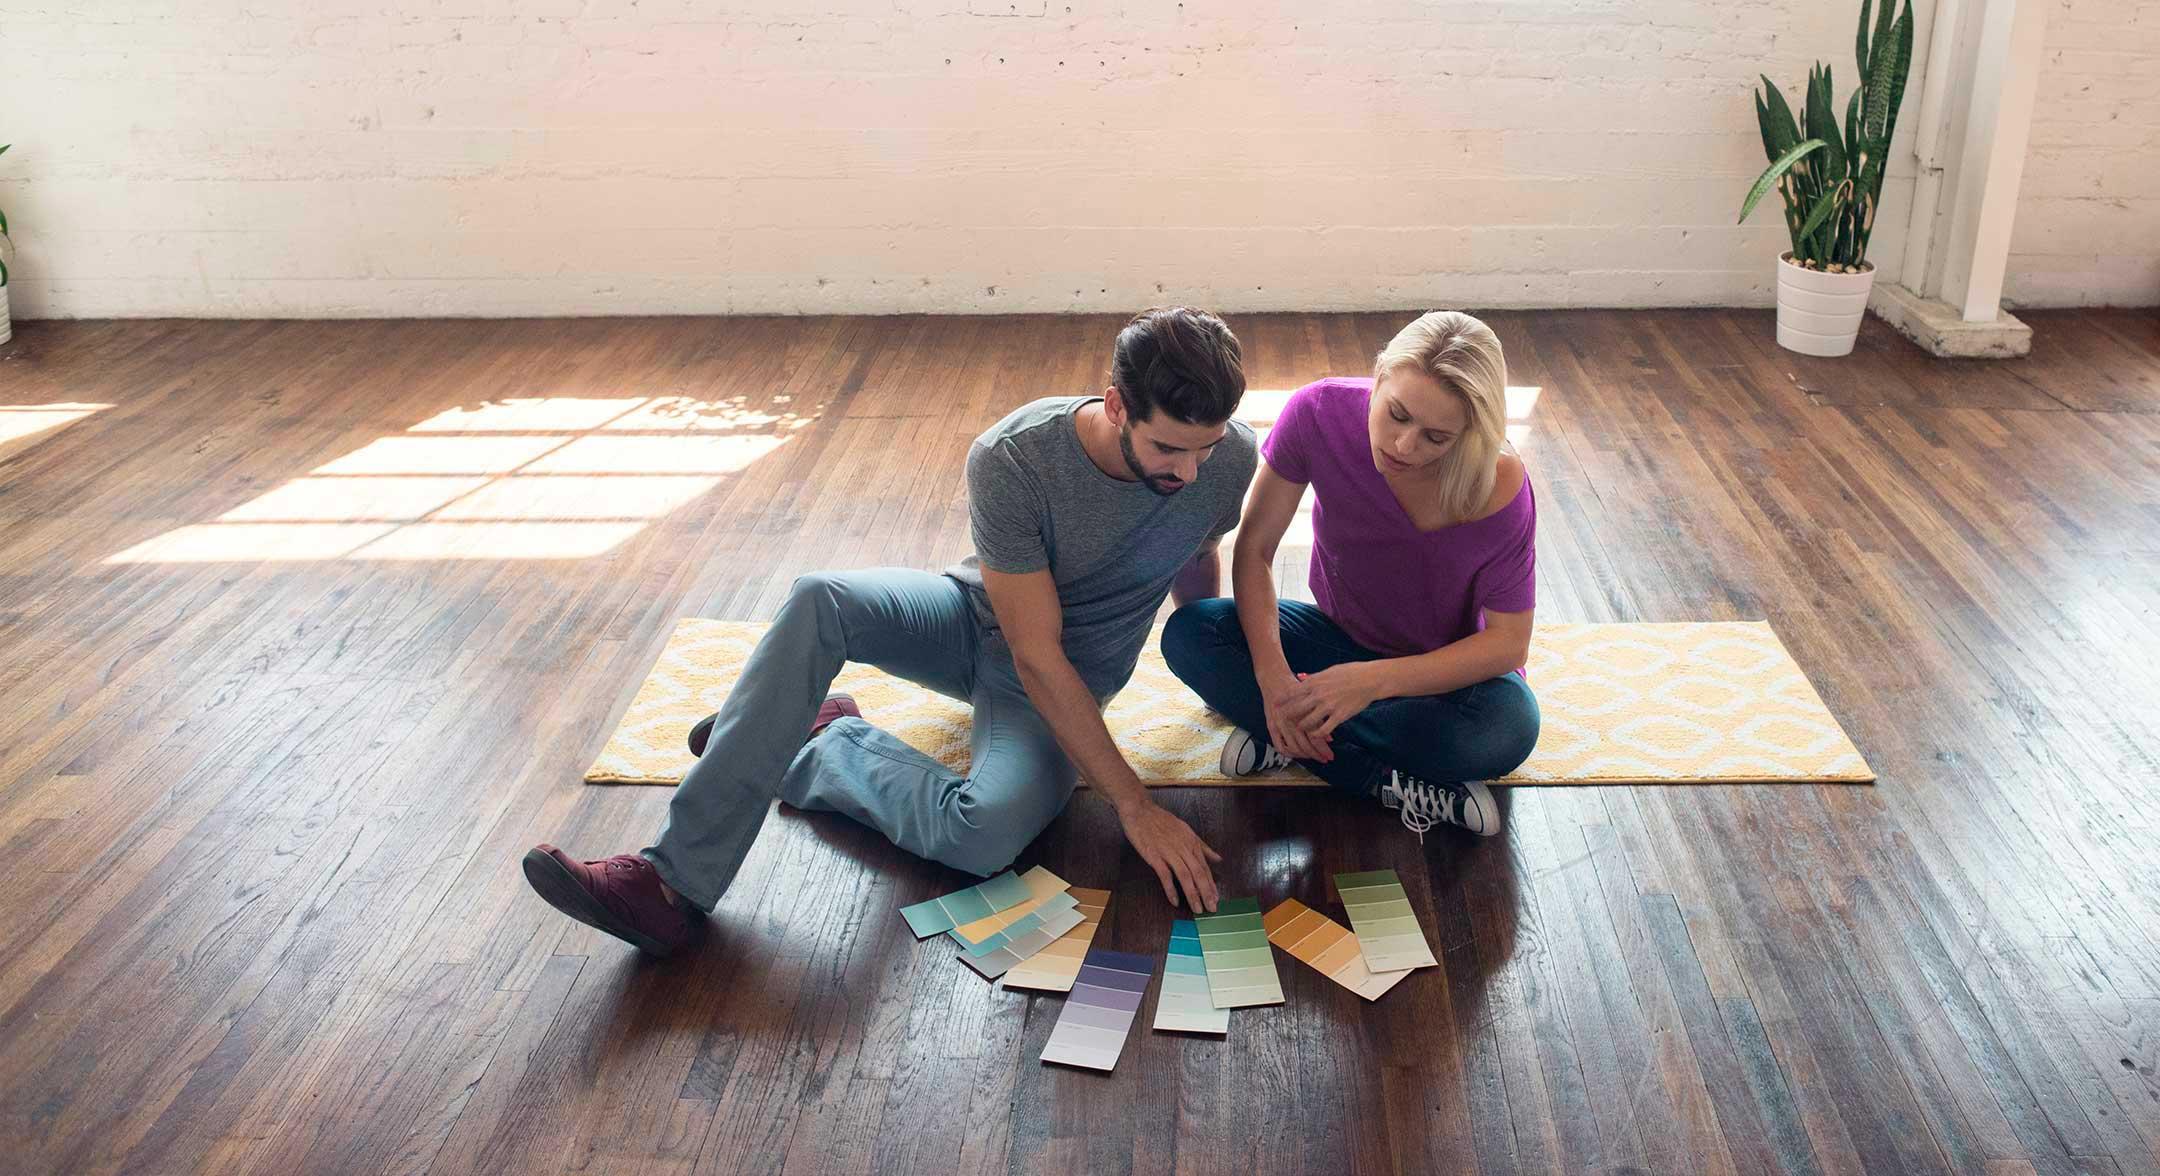 Home improvement ideas | Life Moments | NatWest